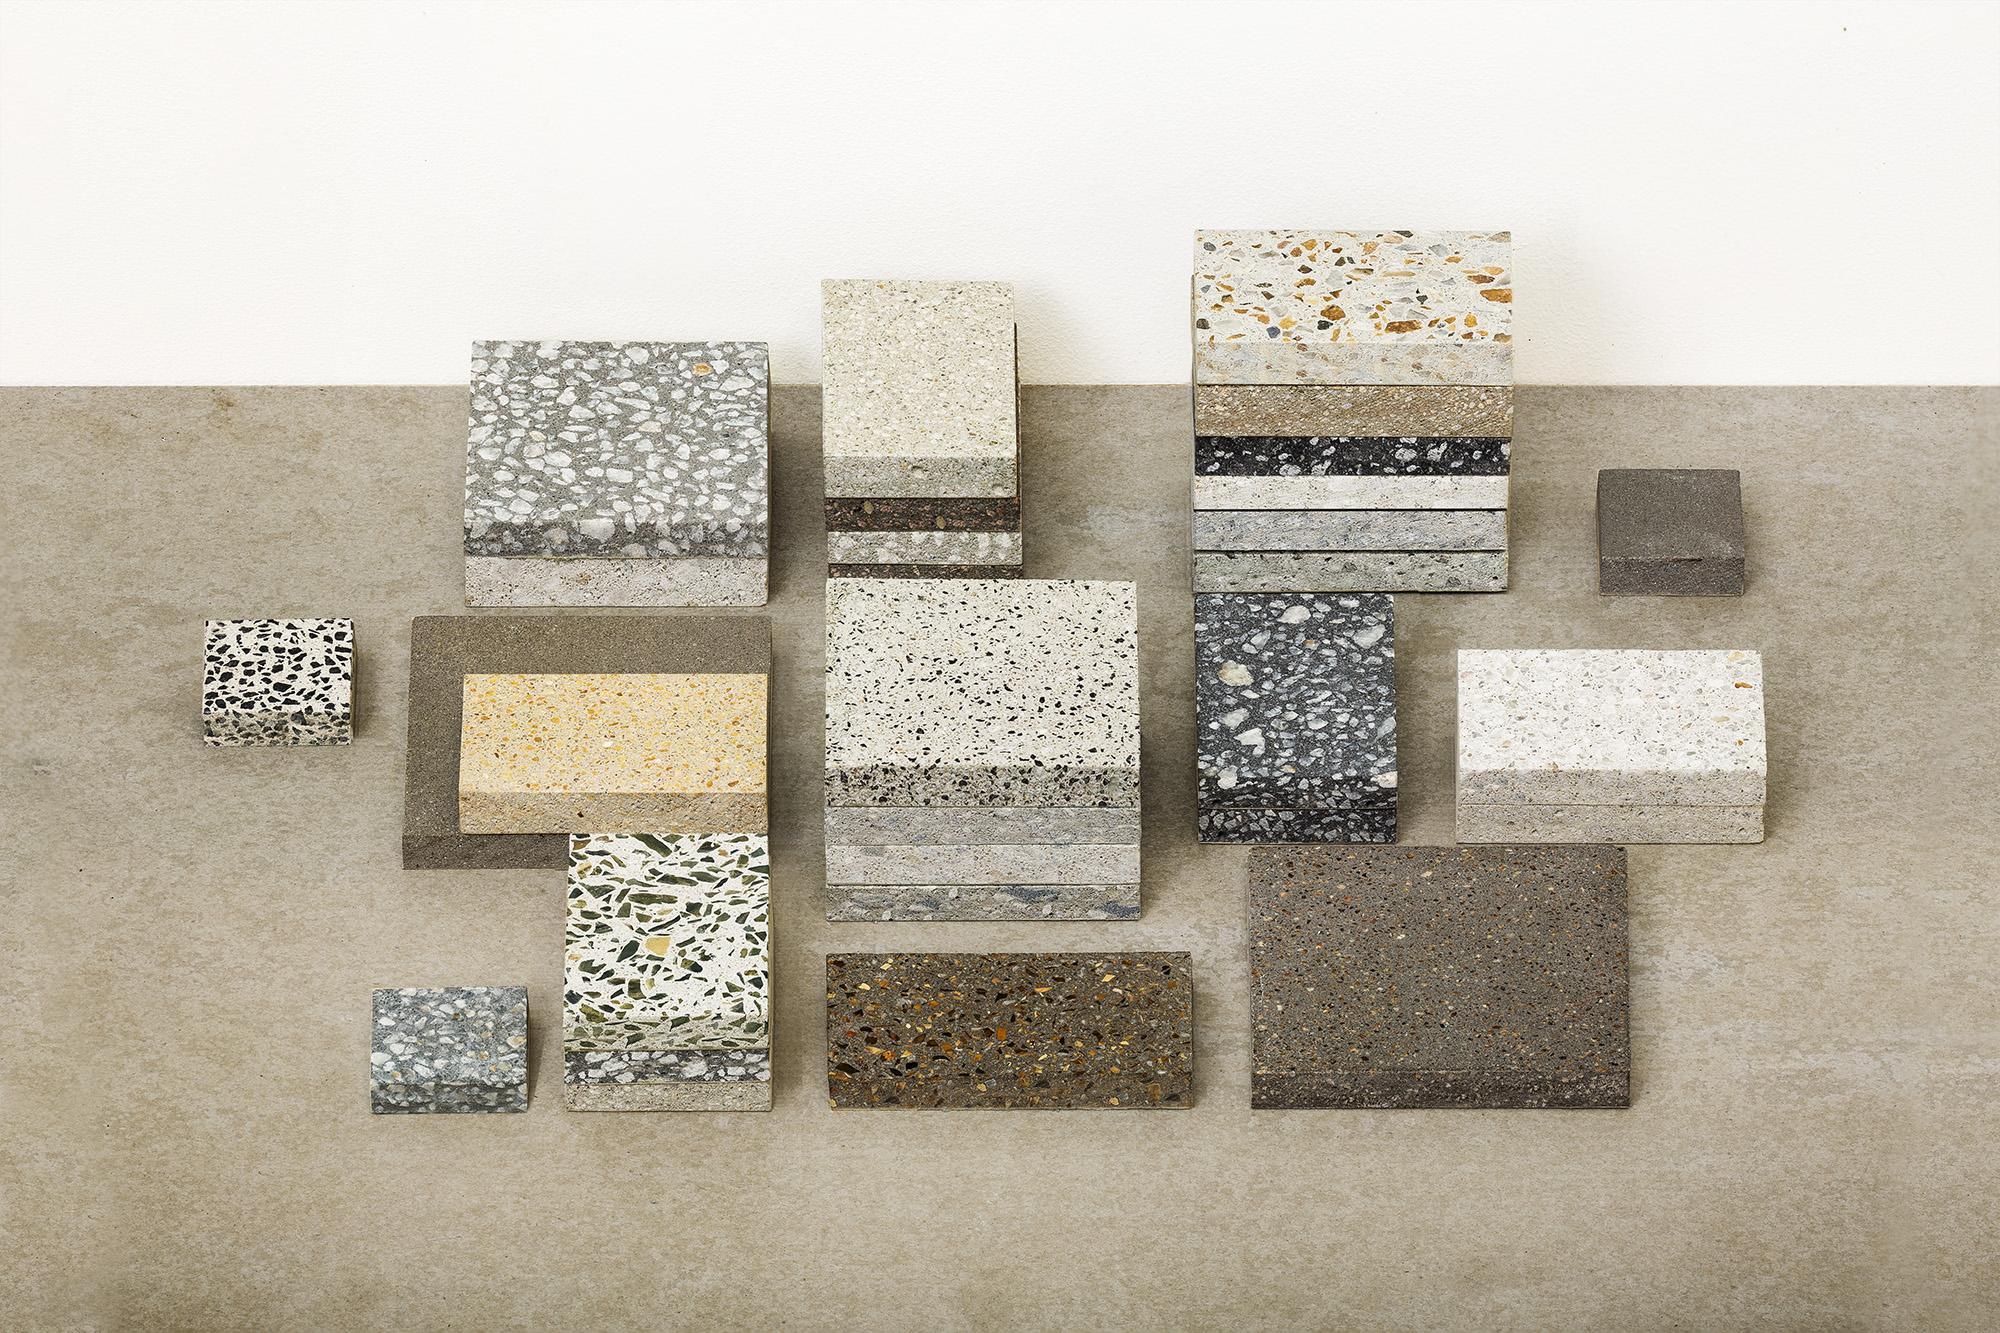 Concrete Surfaces Header image 2.3.jpg